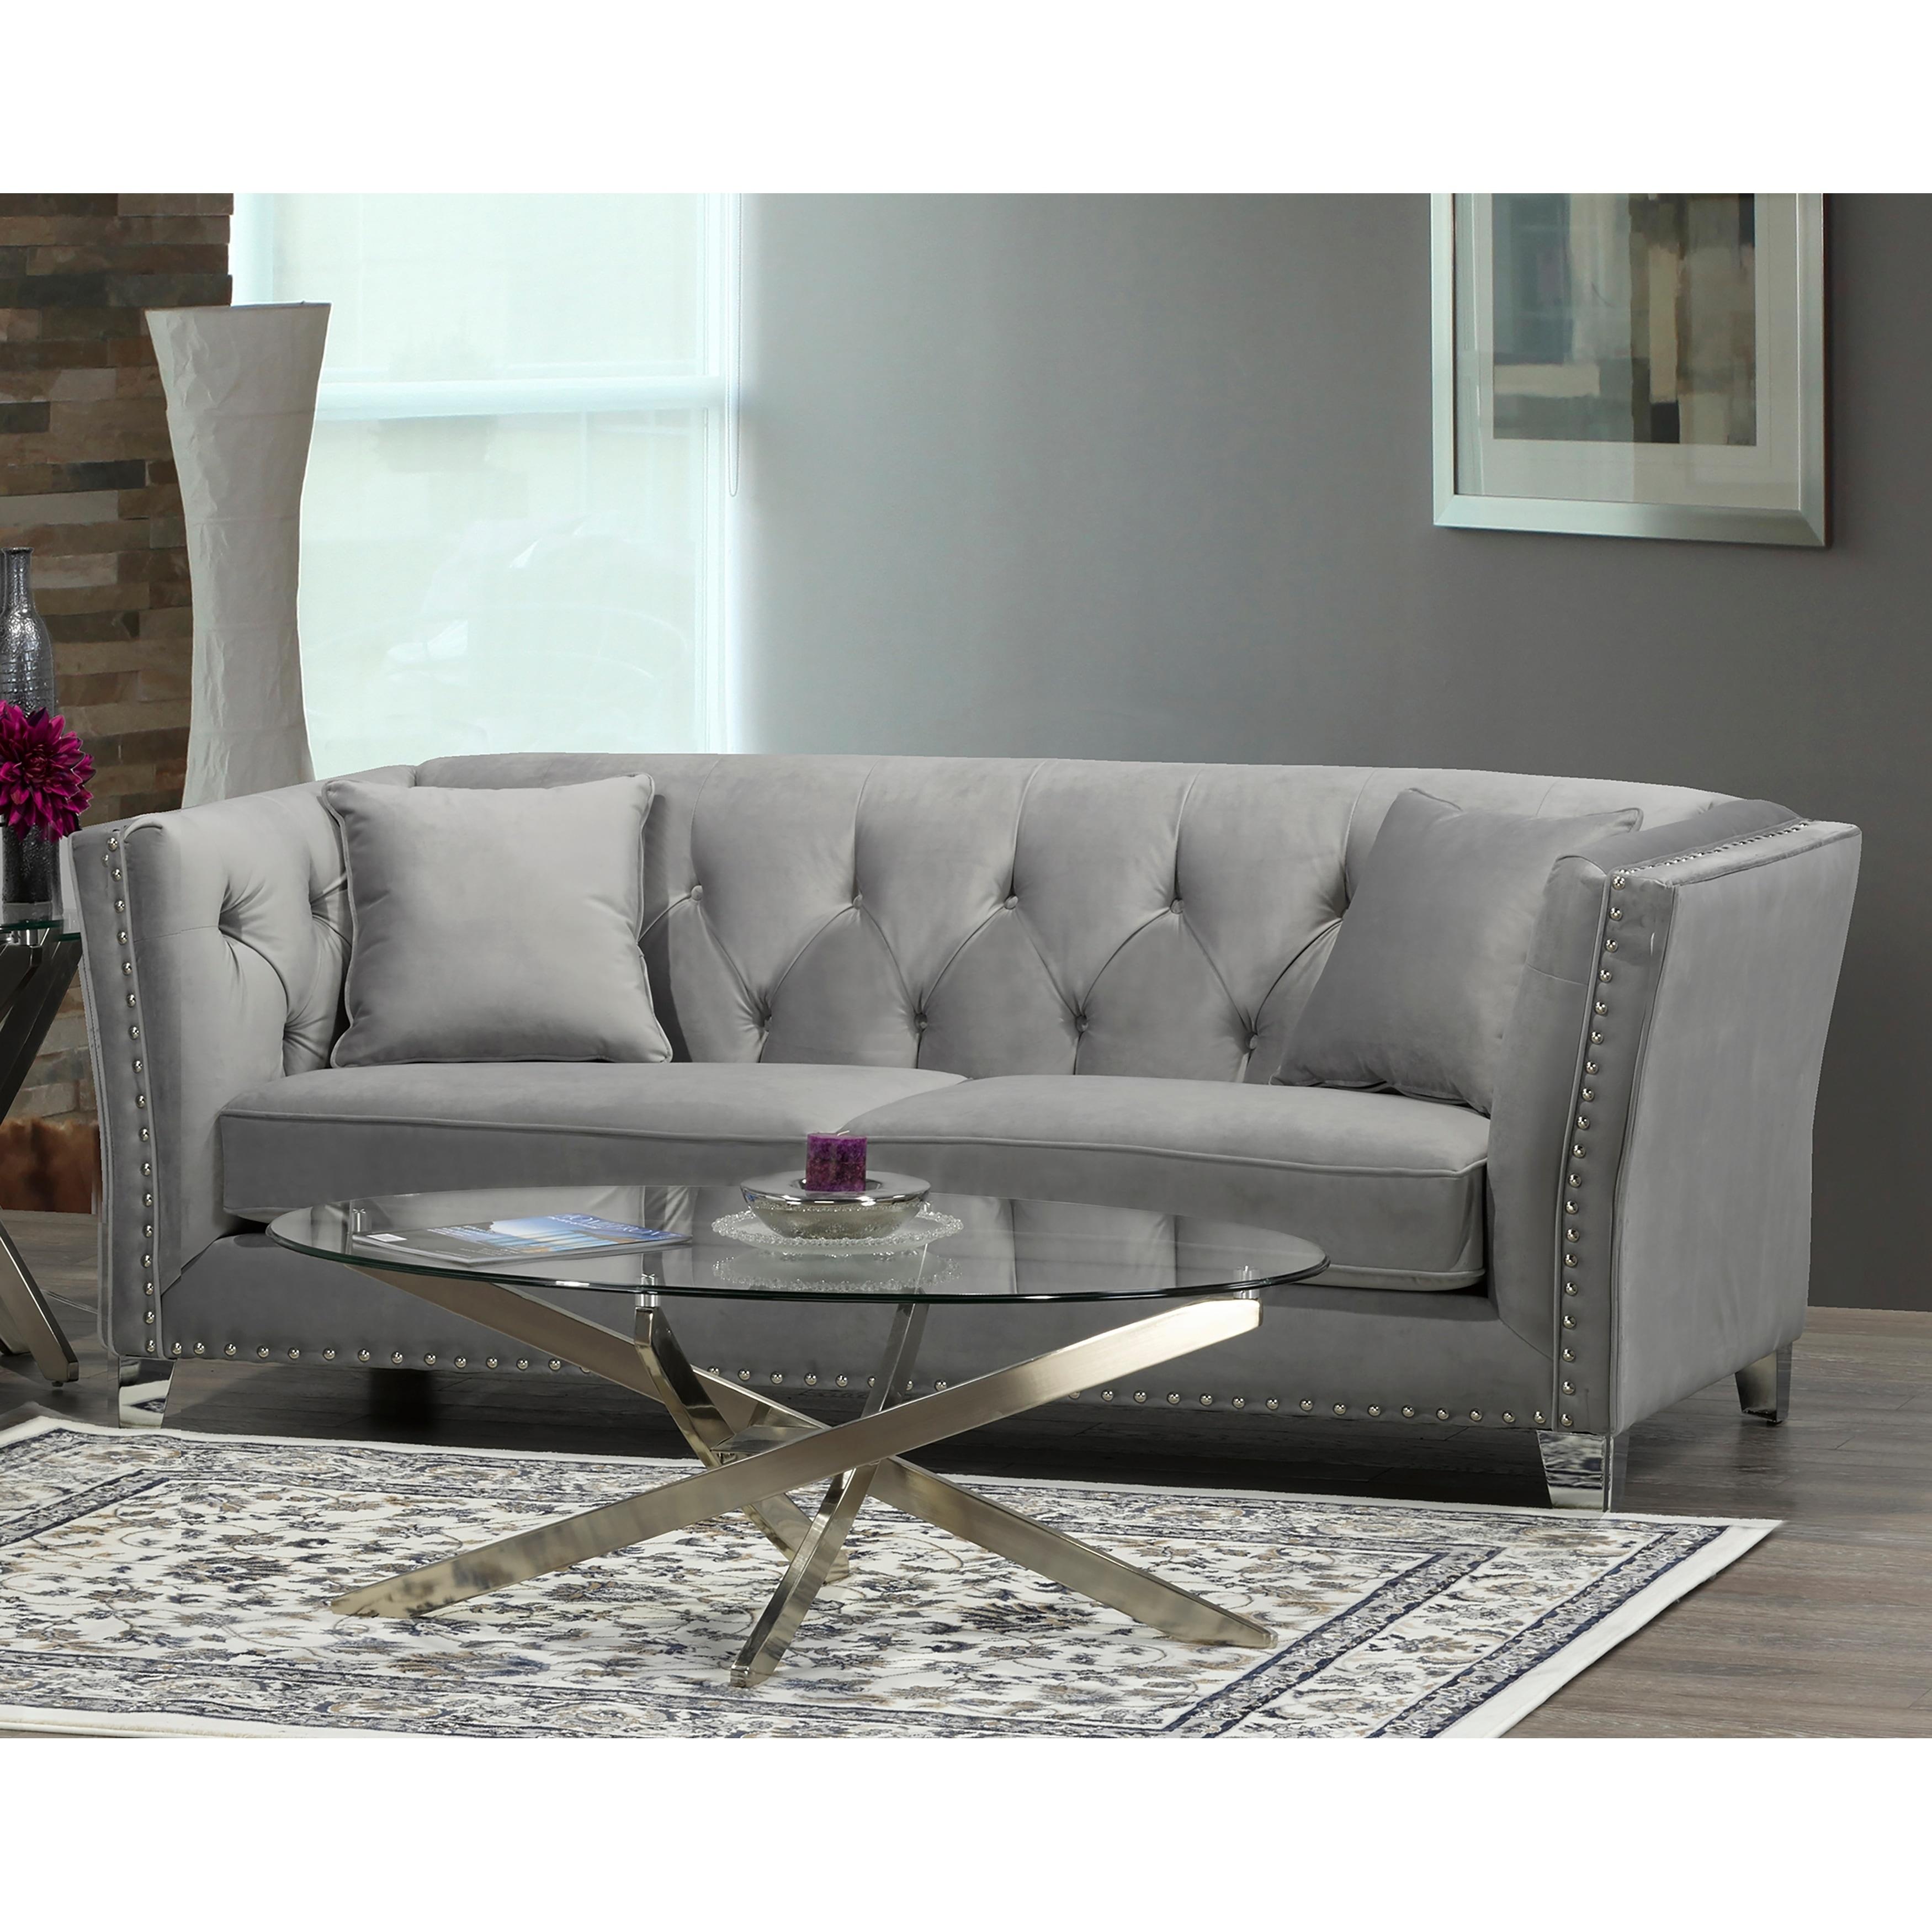 Fiona Modern Grey Velvet Tufted Nailhead Sofa On Free Shipping Today 20847588